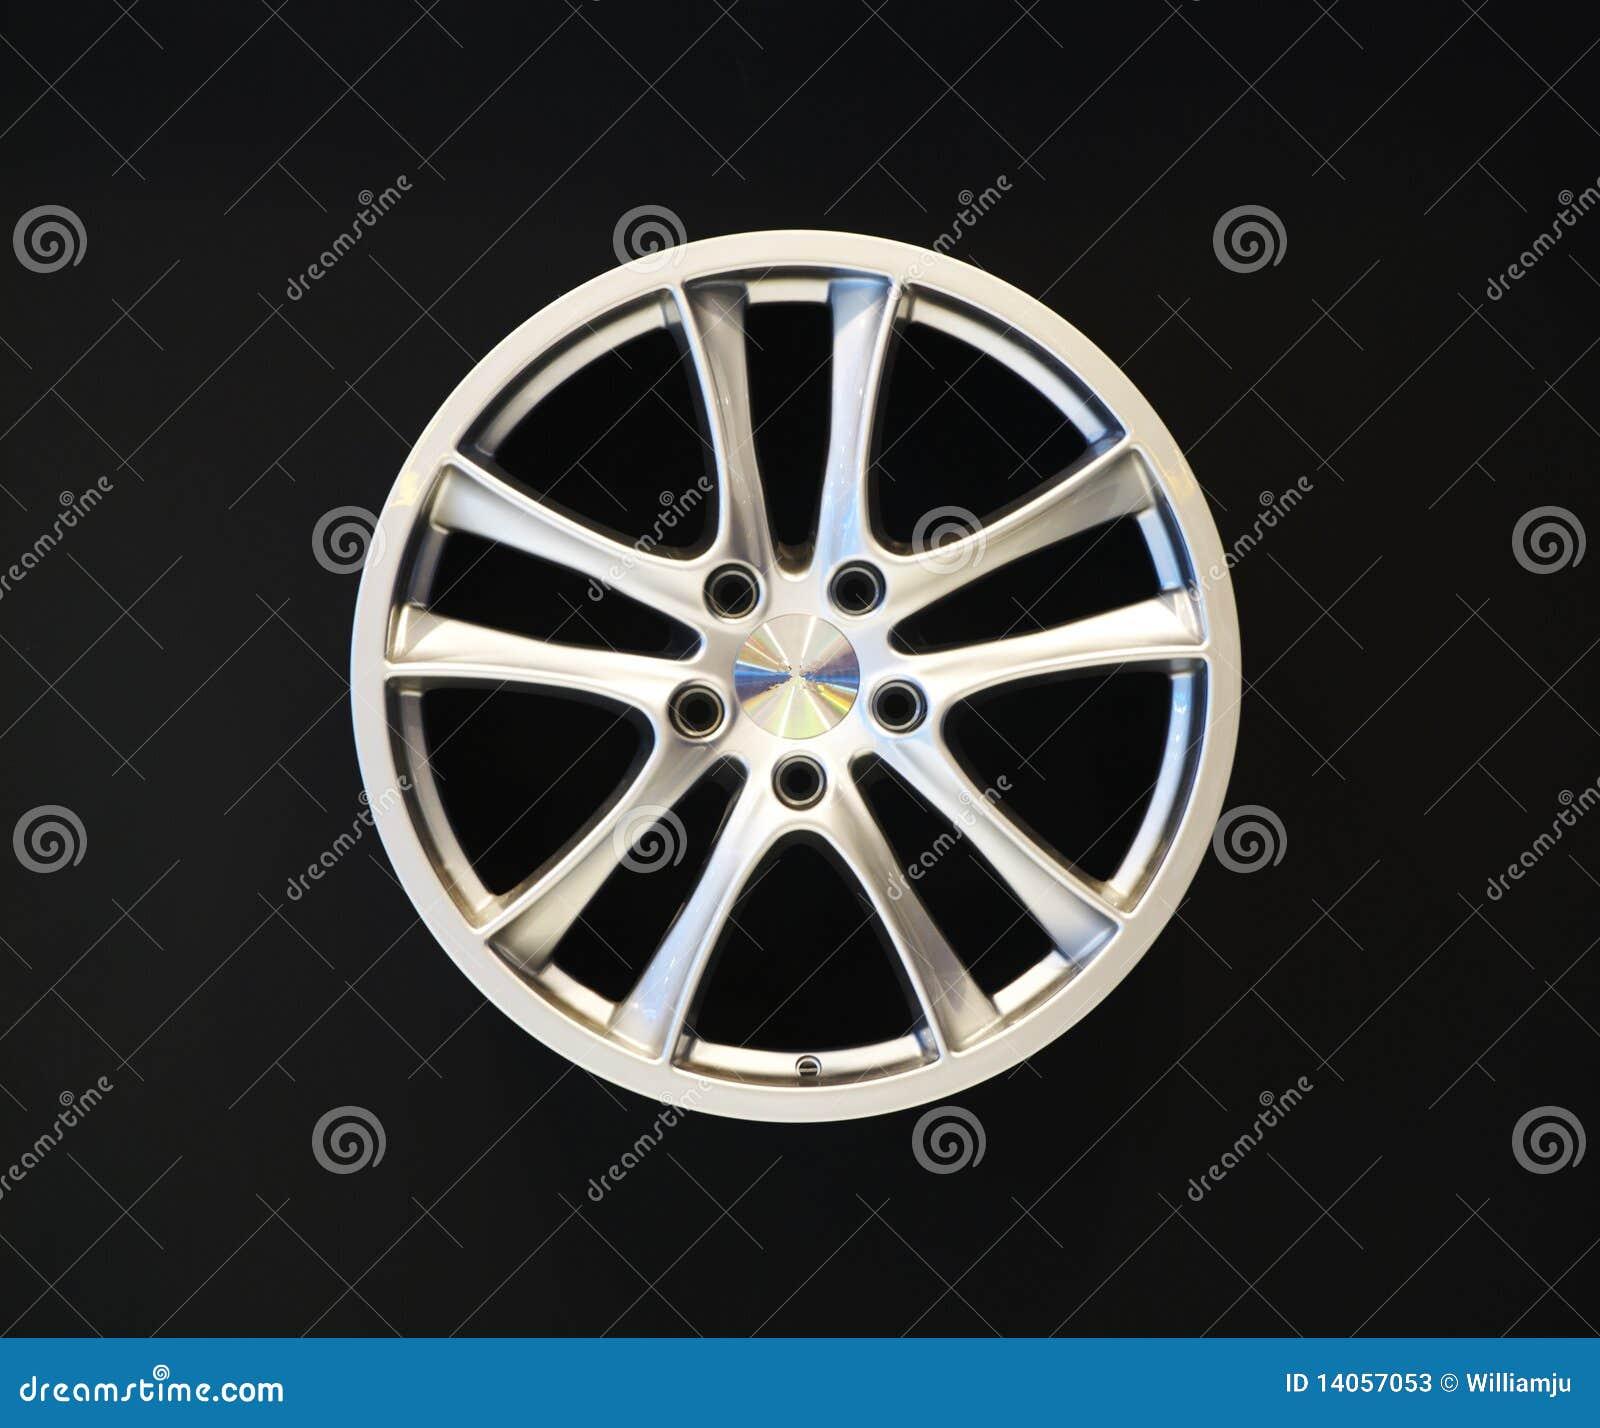 Car Wheel Hub Stock Photos